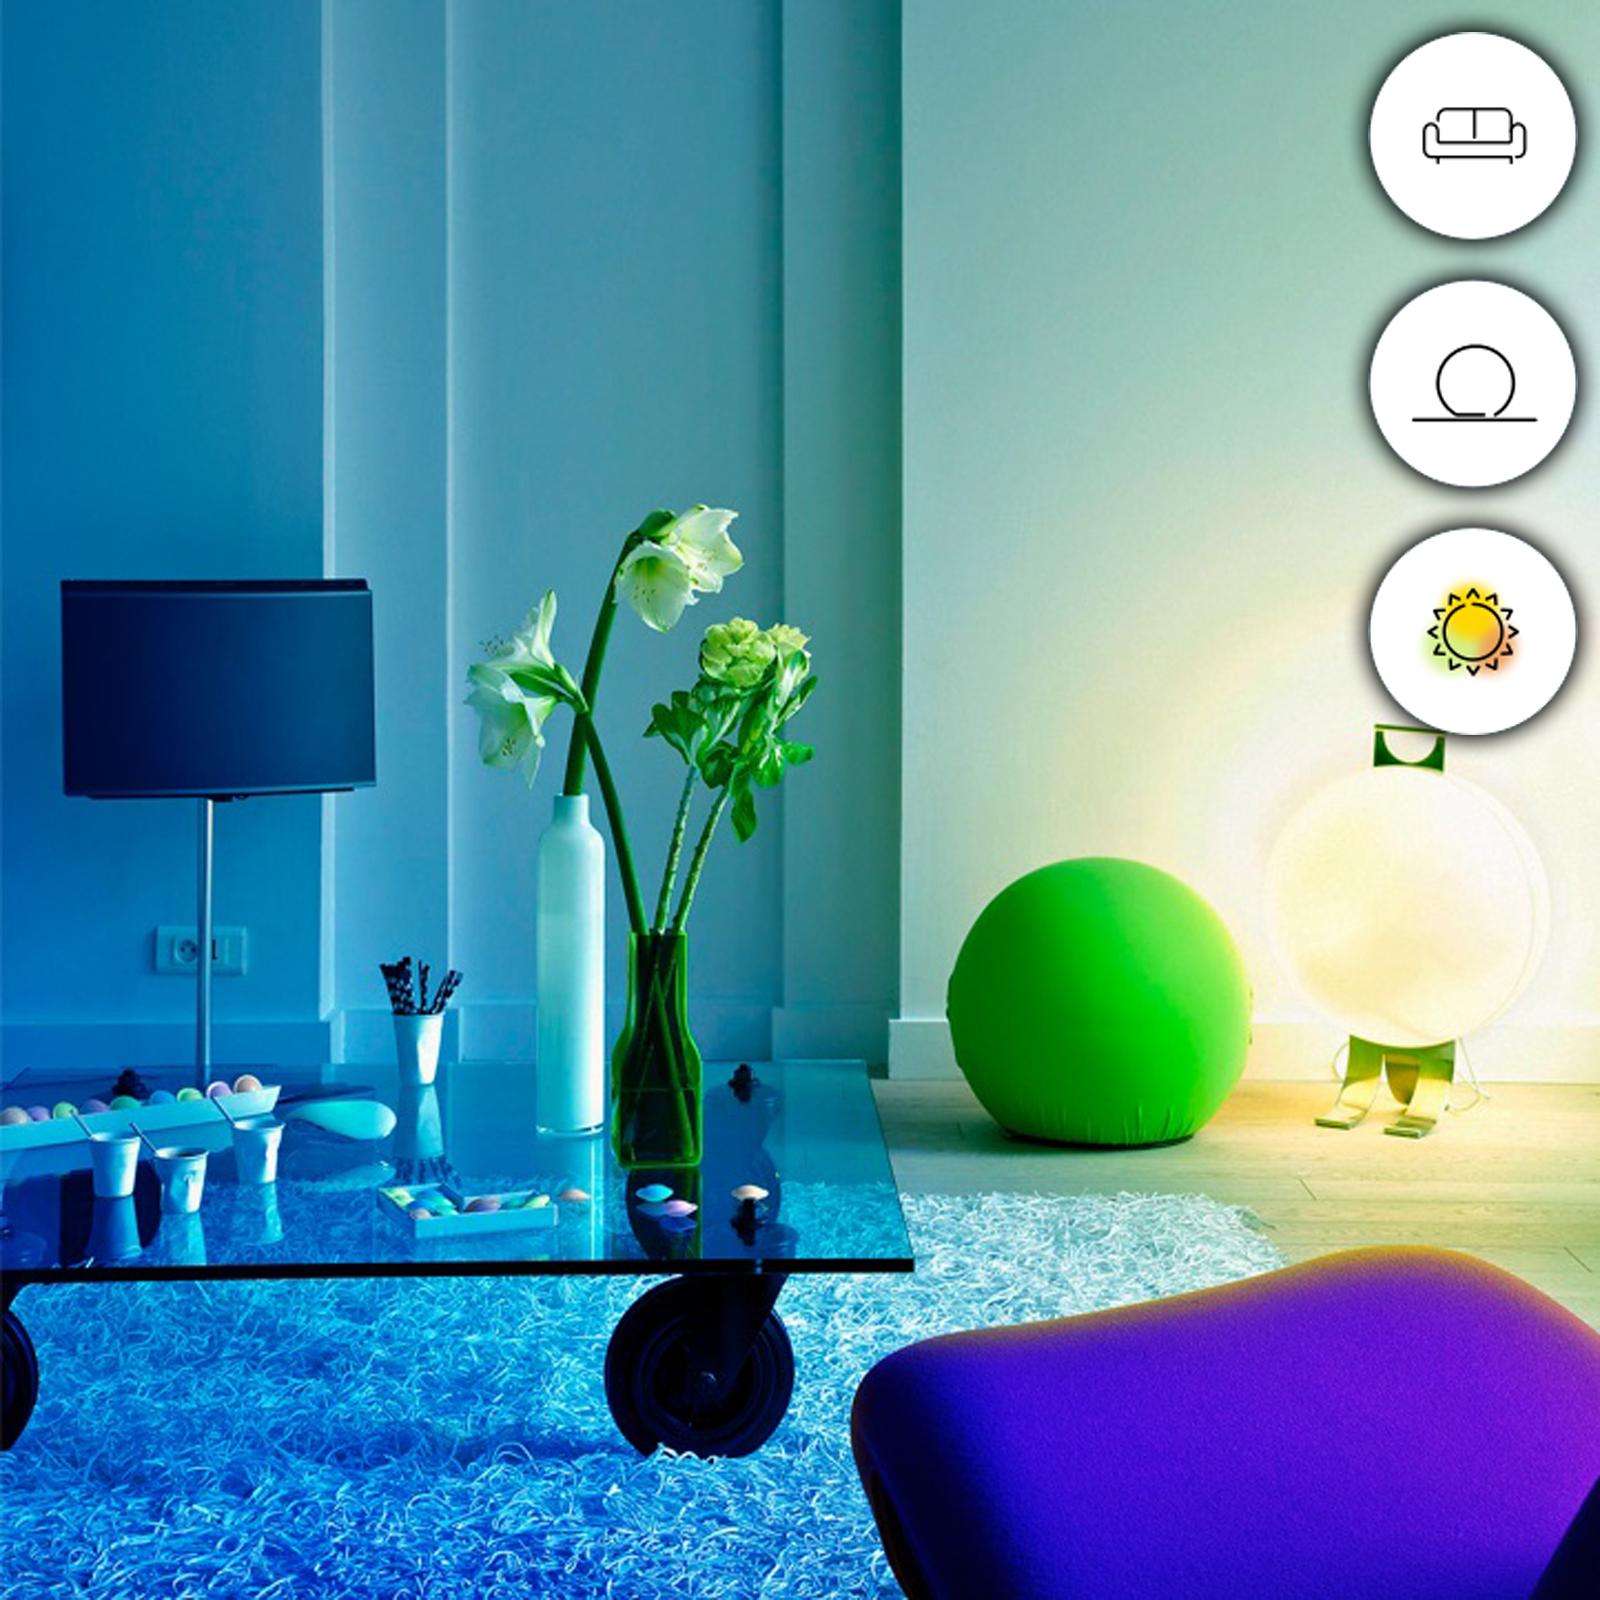 WiZ Smart Table Lamps